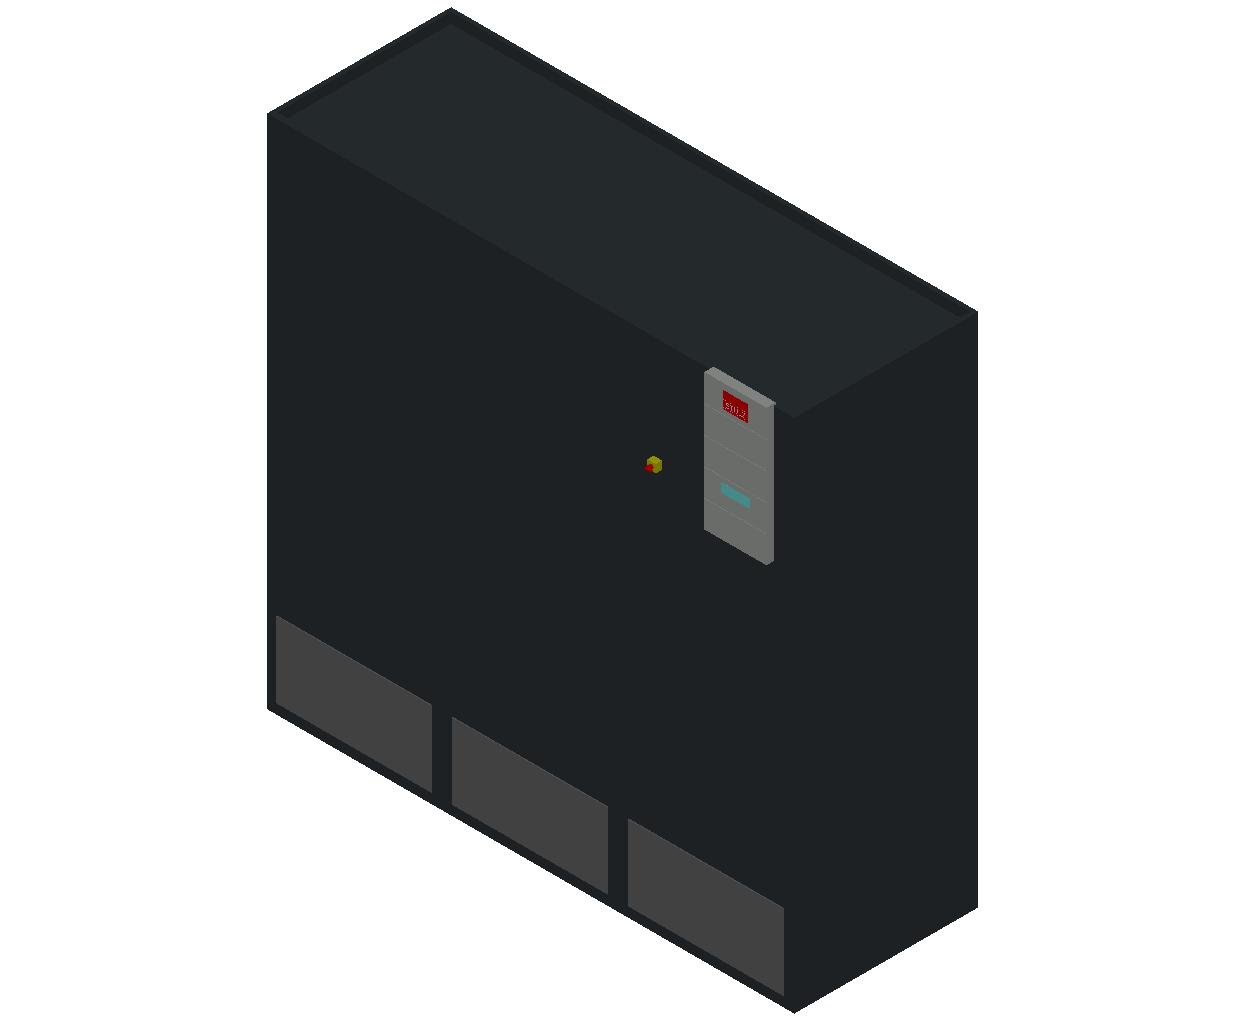 HC_Air Conditioner_Indoor Unit_MEPcontent_STULZ_CyberAir 3PRO_ASR_CW2_ASR_1460_CW2_INT-EN.dwg